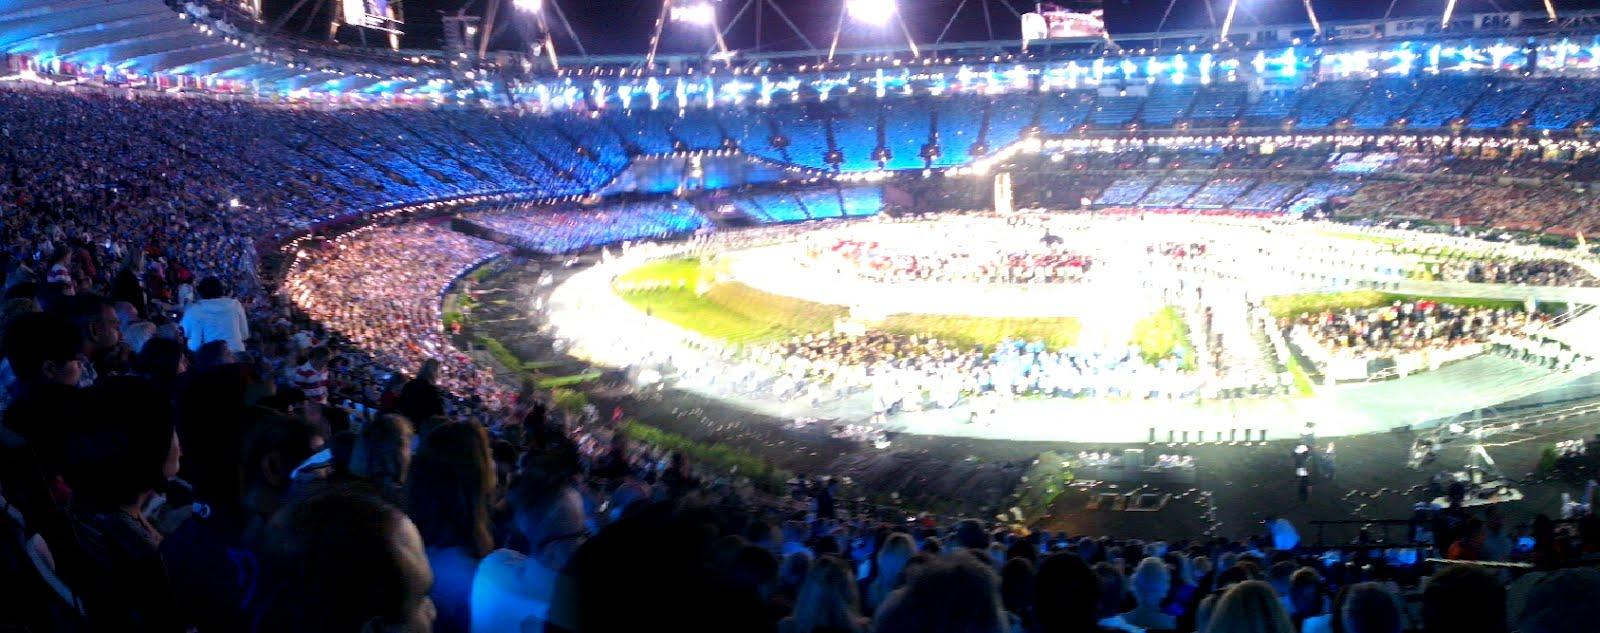 Indigo Roth'S Olympic Opening Ceremony